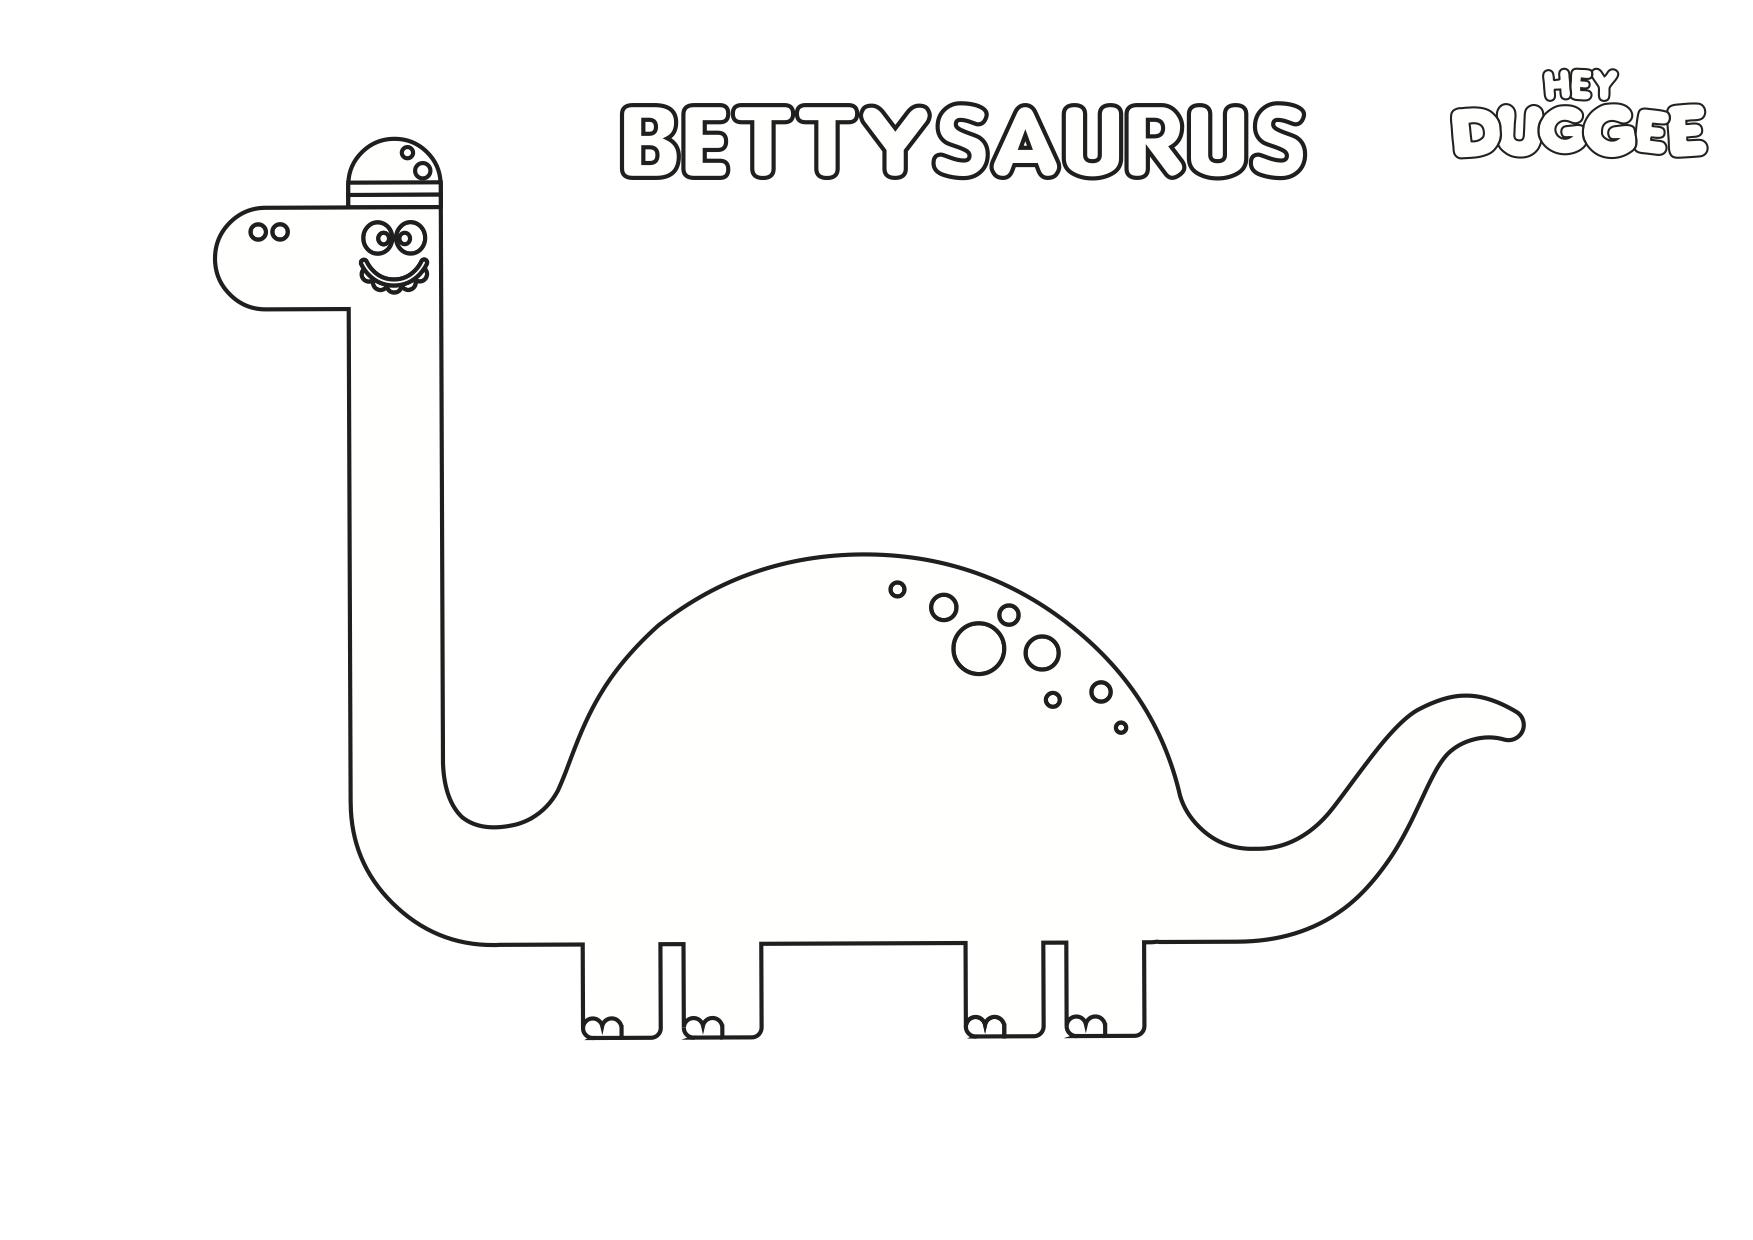 Bettysaurus